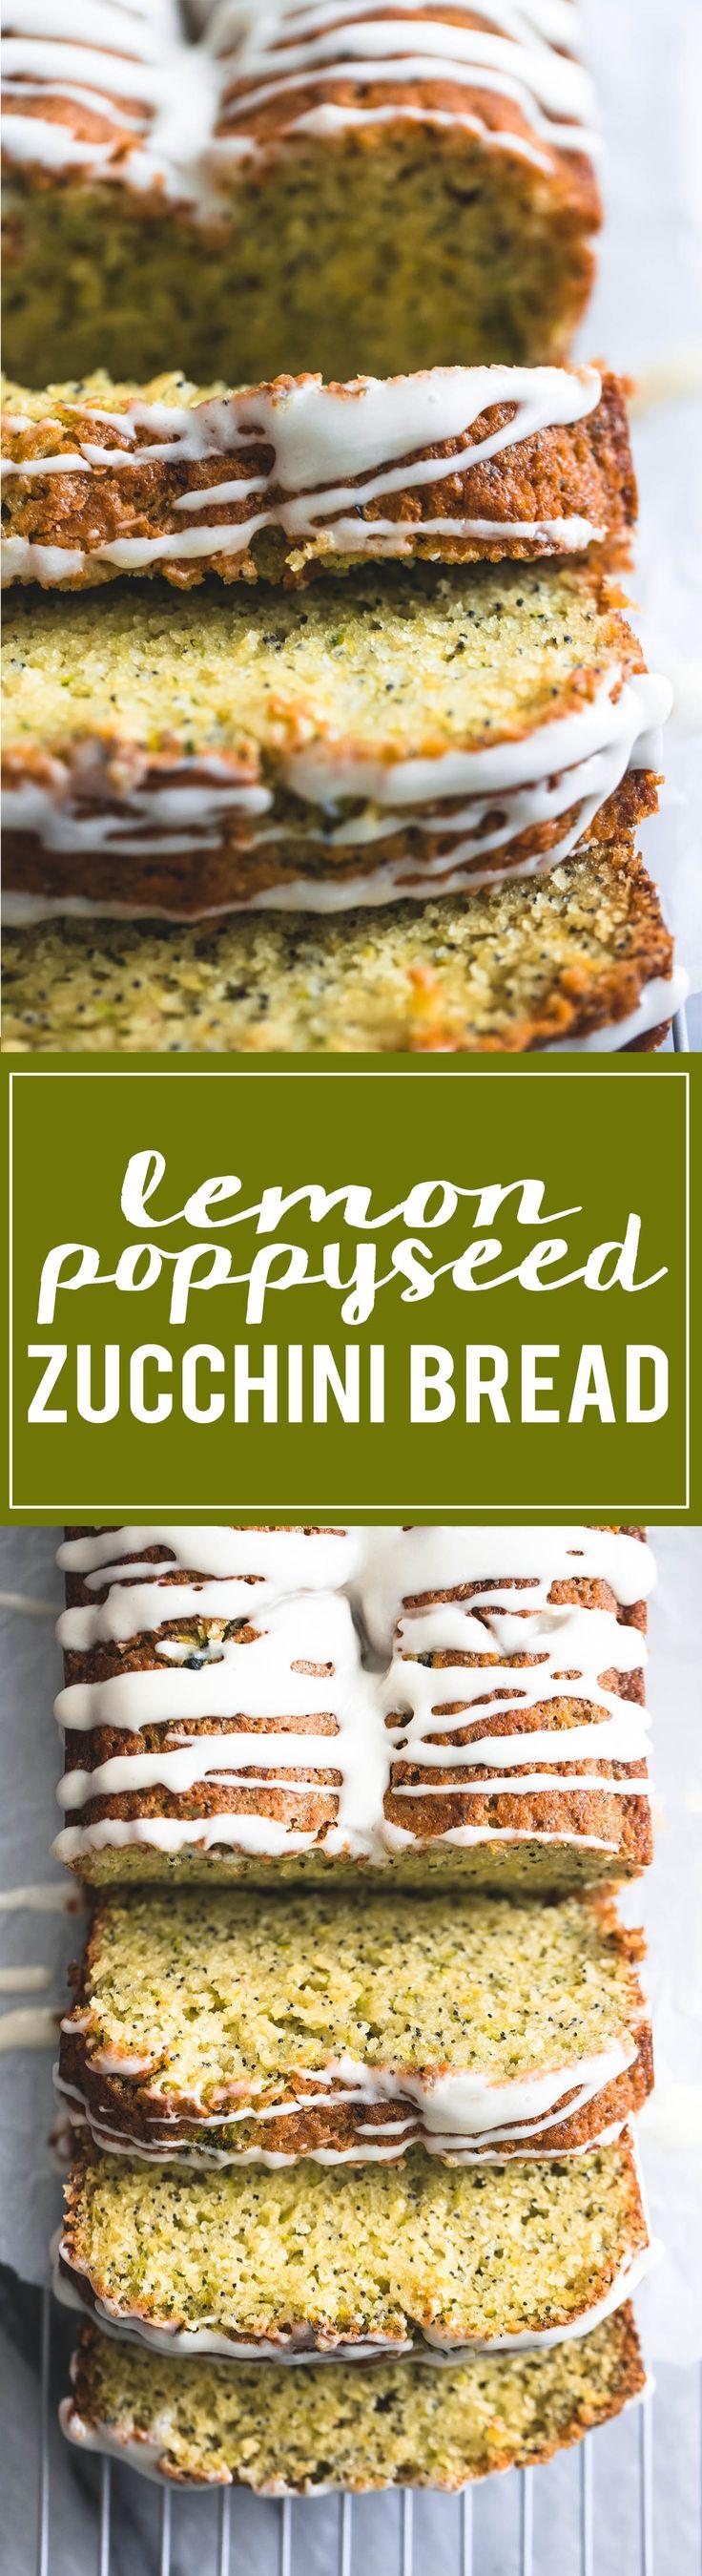 Super moist Lemon Poppyseed Zucchini Bread with lemon cream cheese glaze | lecremedelacrumb.com